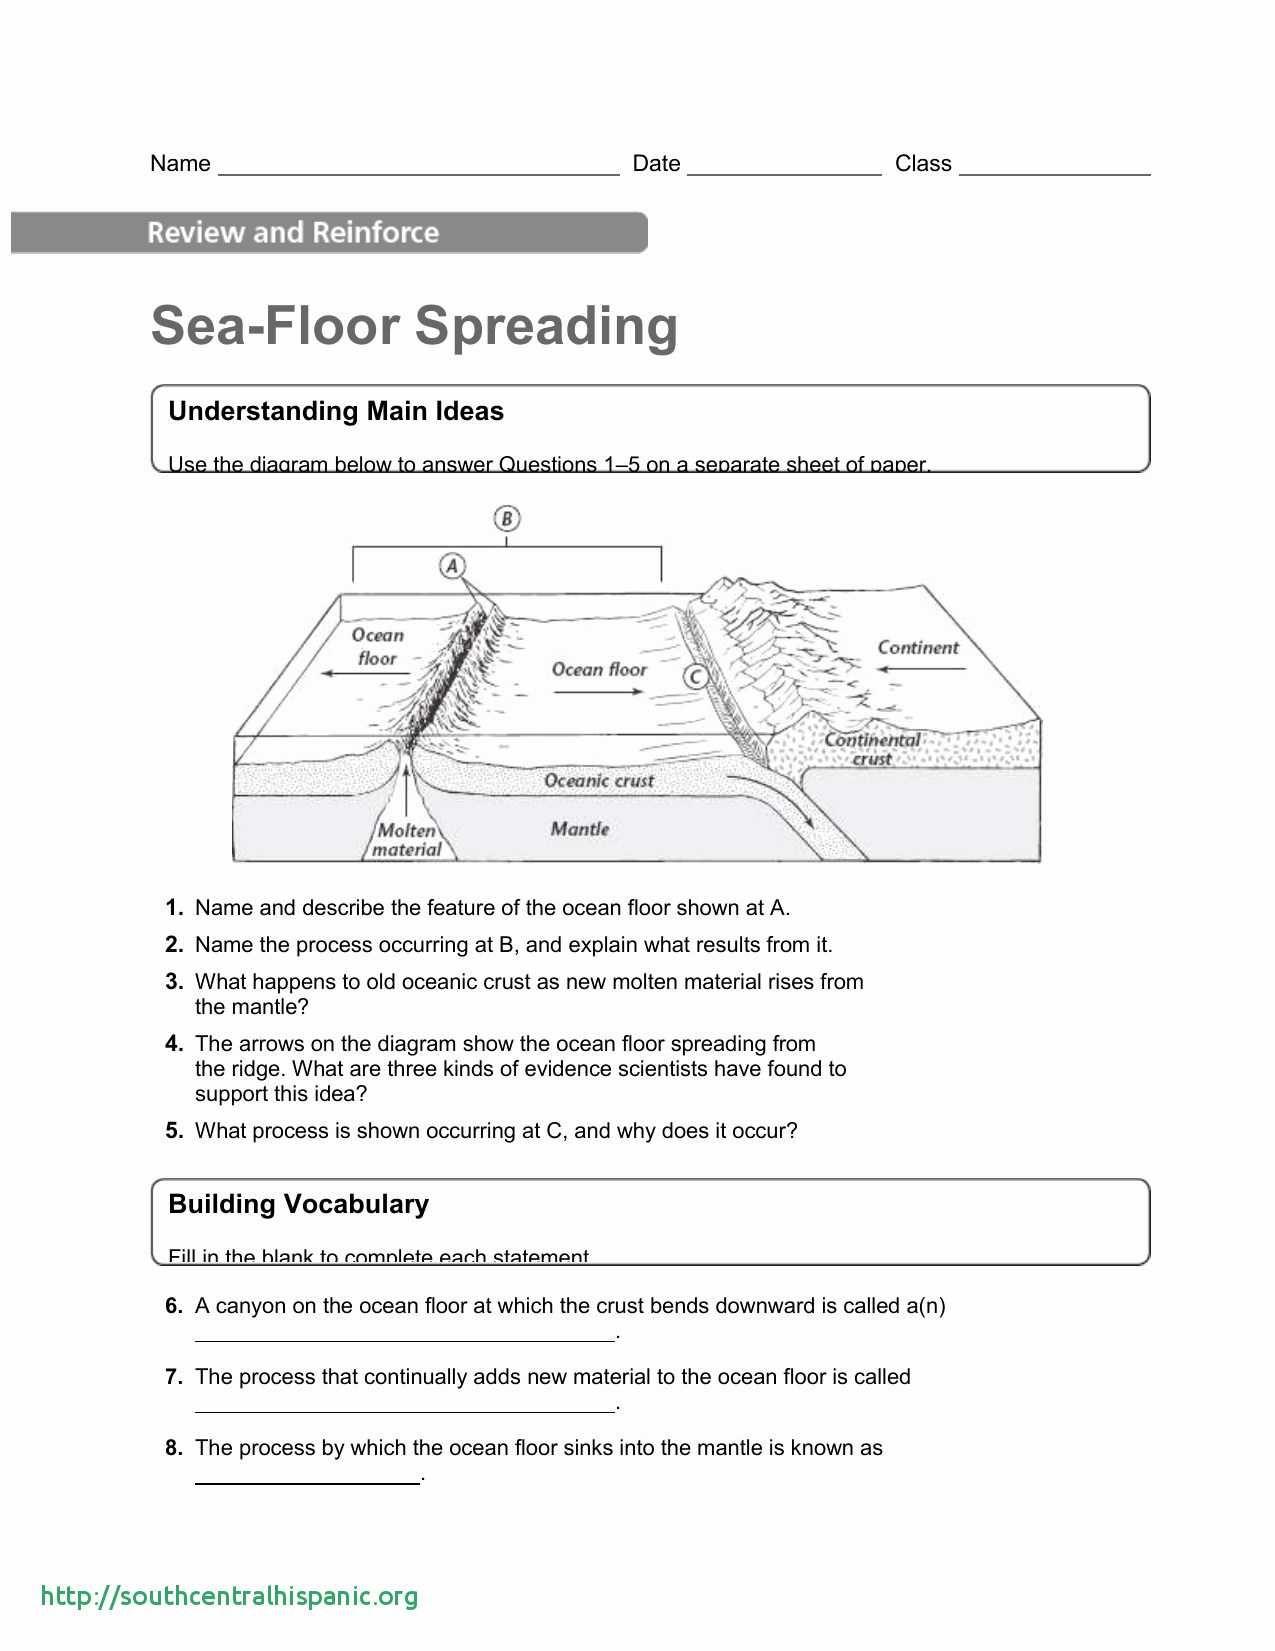 Sea Floor Spreading Worksheet Pdf With Images Sea Floor